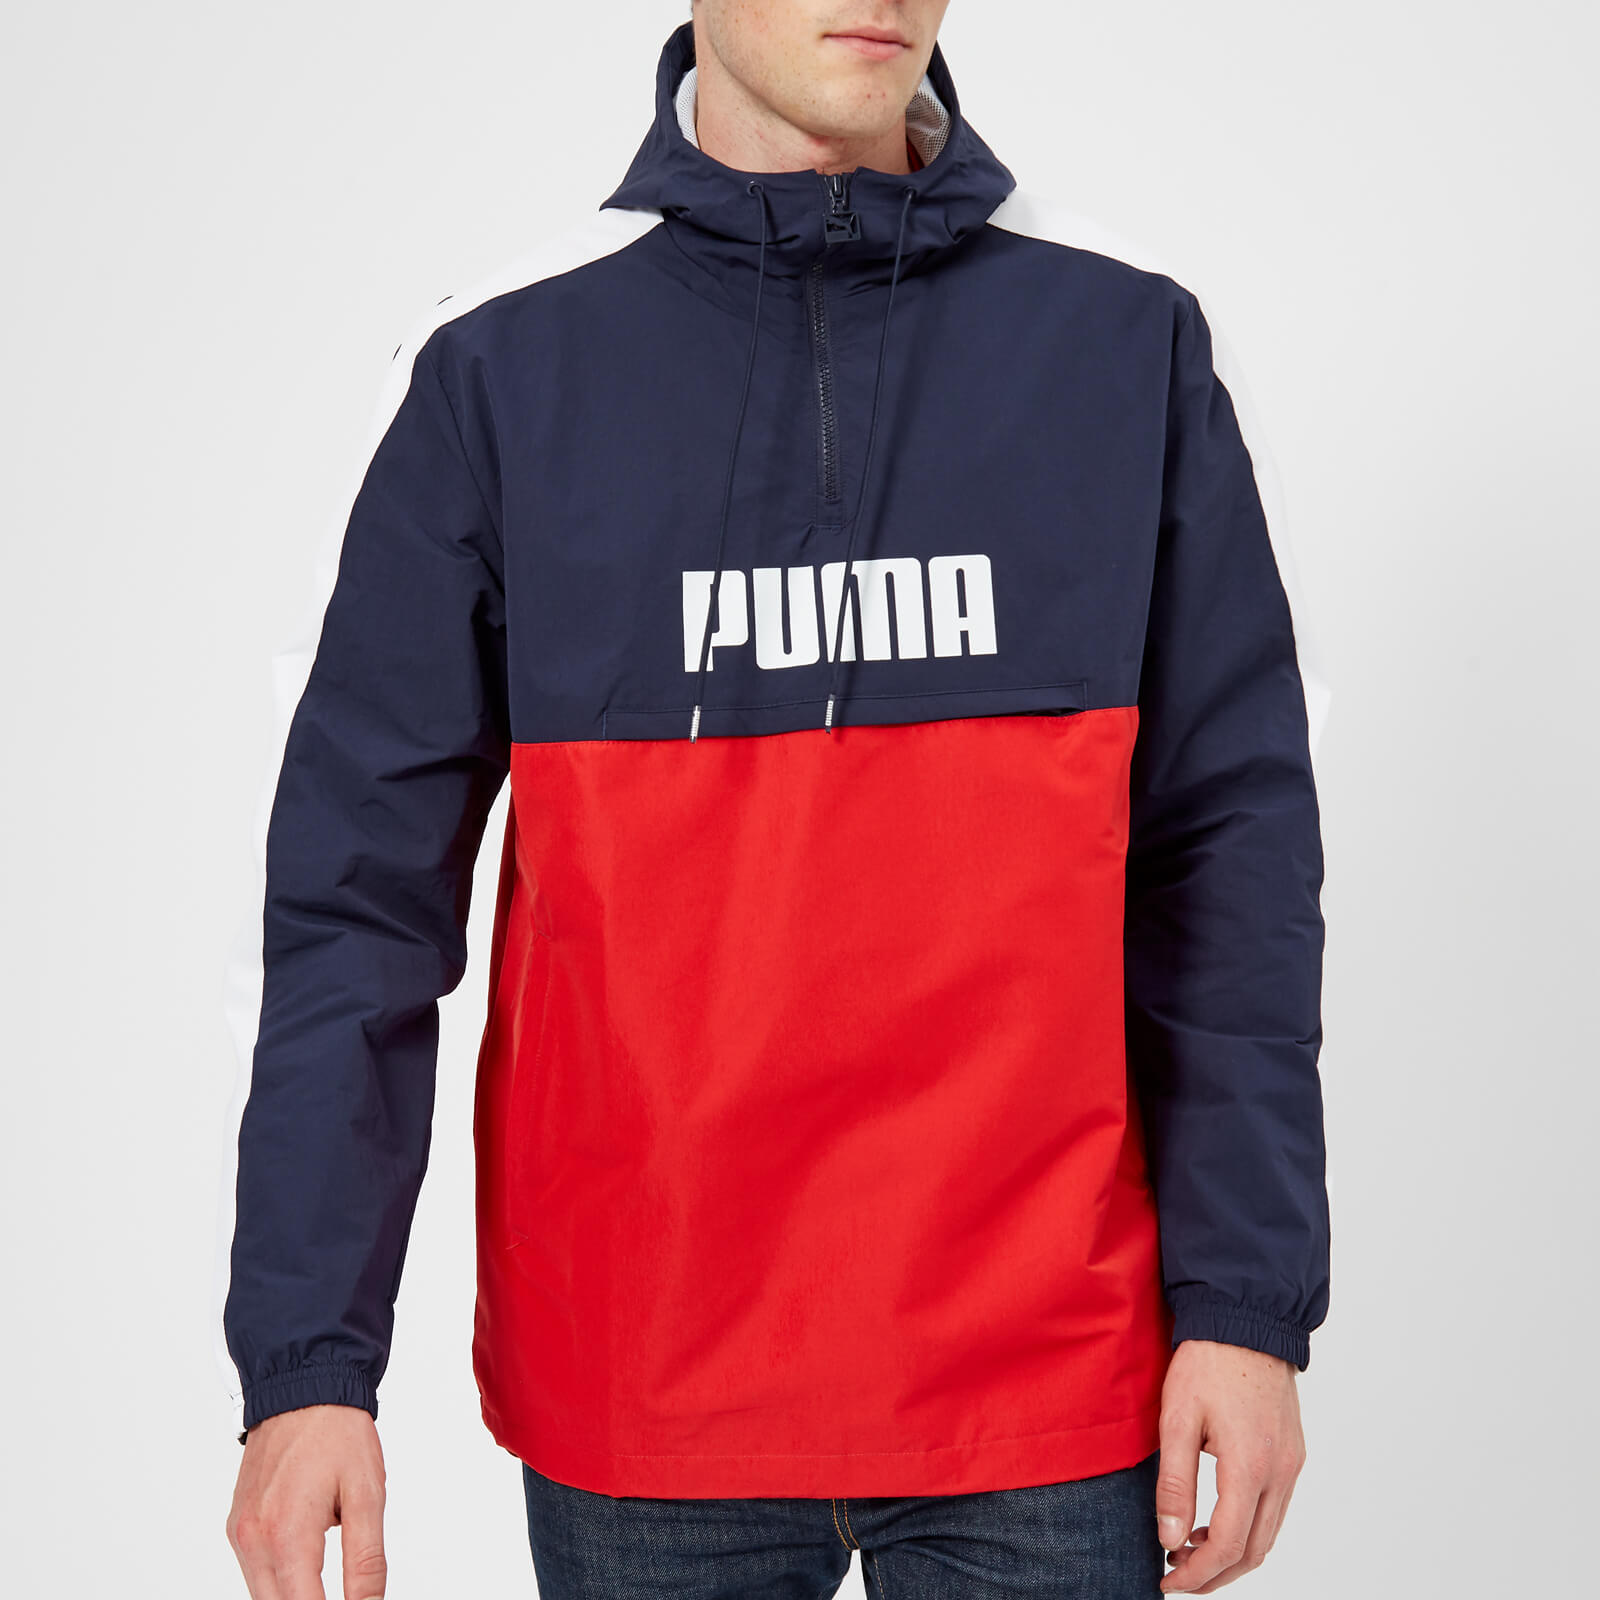 8ce8b7e5019f1 Puma Men's Retro Half Zip Windbreaker Jacket - Peacoat